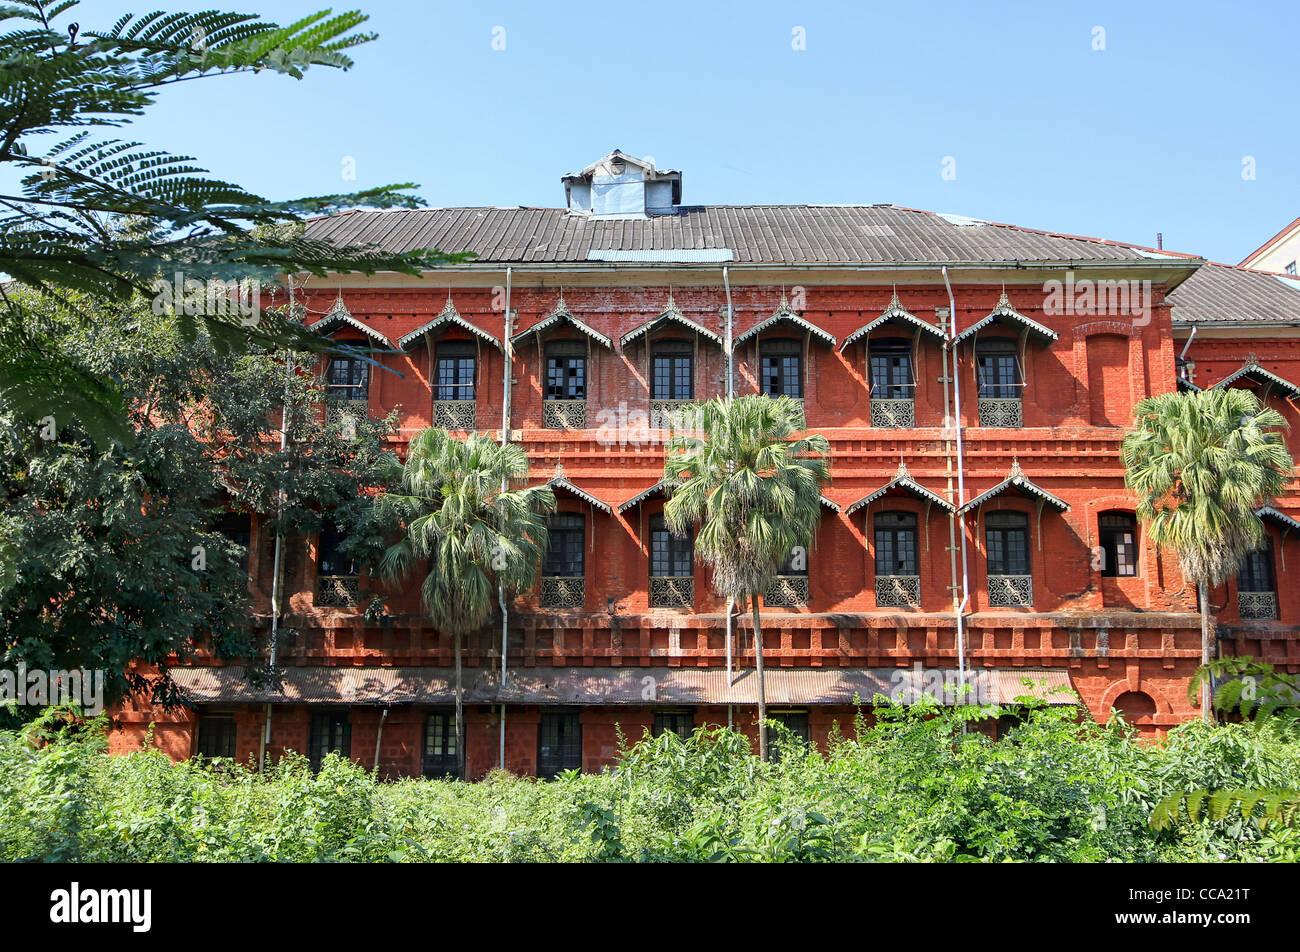 Old Burma Railway Headquarters, Yangon - Stock Image